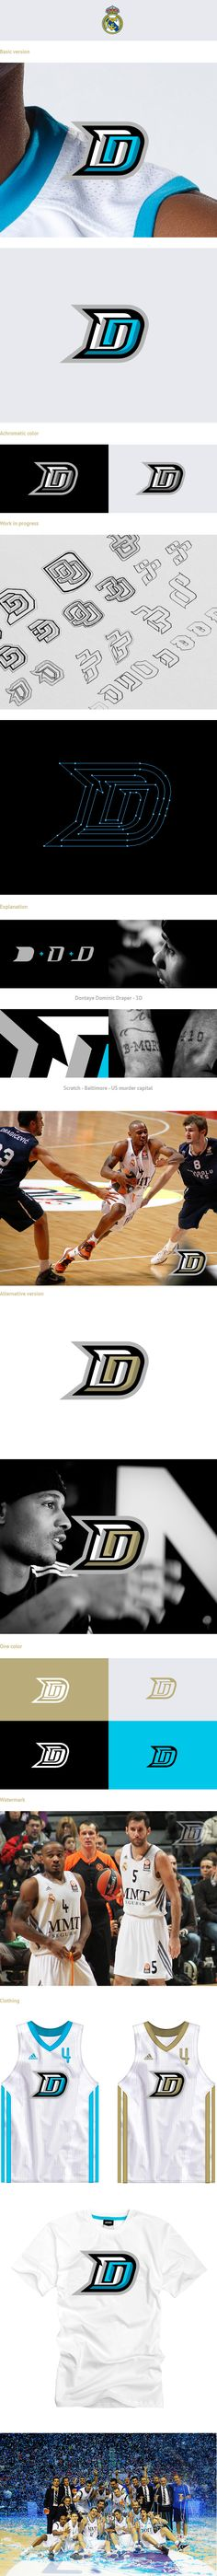 Dontaye Draper - Real Madrid by Kamil Doliwa, via Behance Logo Branding, Branding Design, Sports Team Logos, Sports Marketing, E Sport, Sports Graphics, Logo Design Inspiration, Design Ideas, Typography Poster